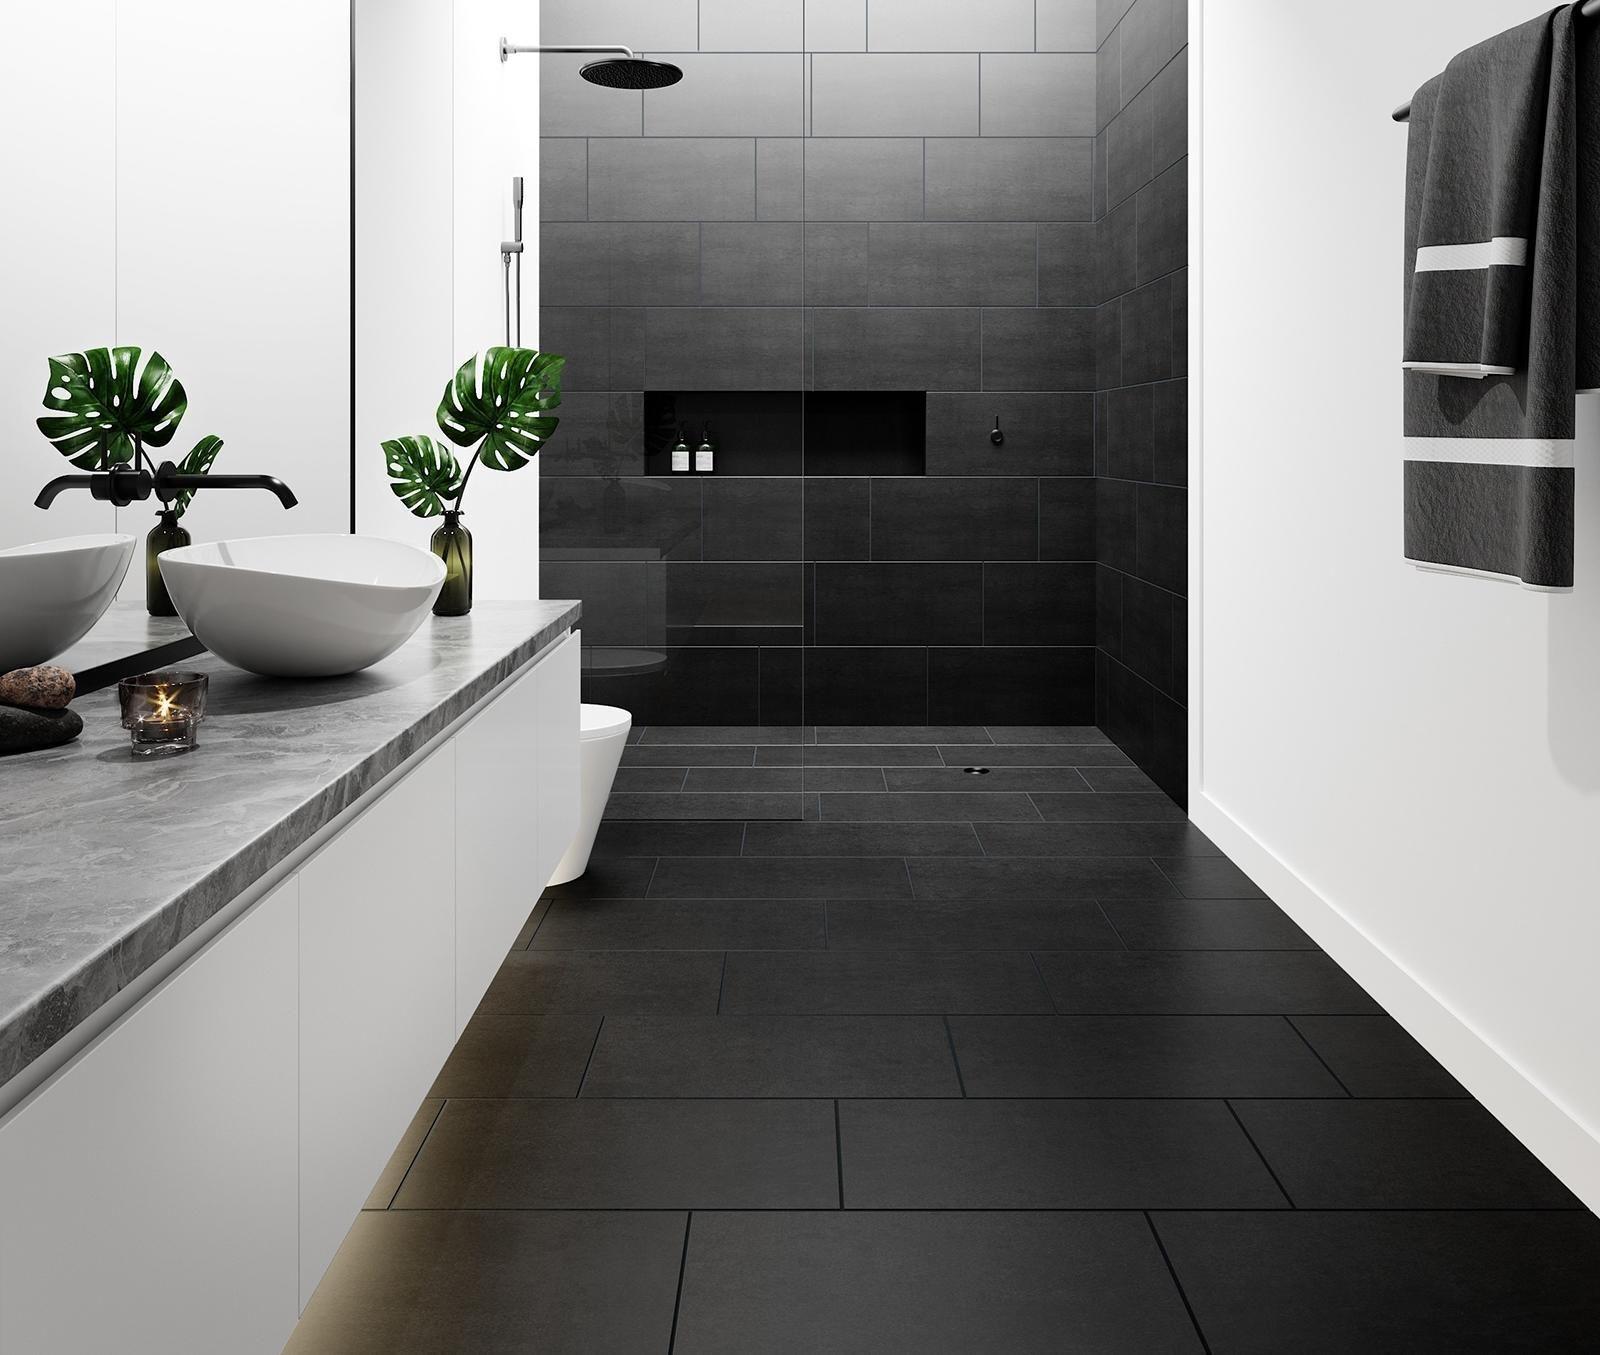 Lounge Black Matt Porcelain in 2020 | Grey kitchen floor ...